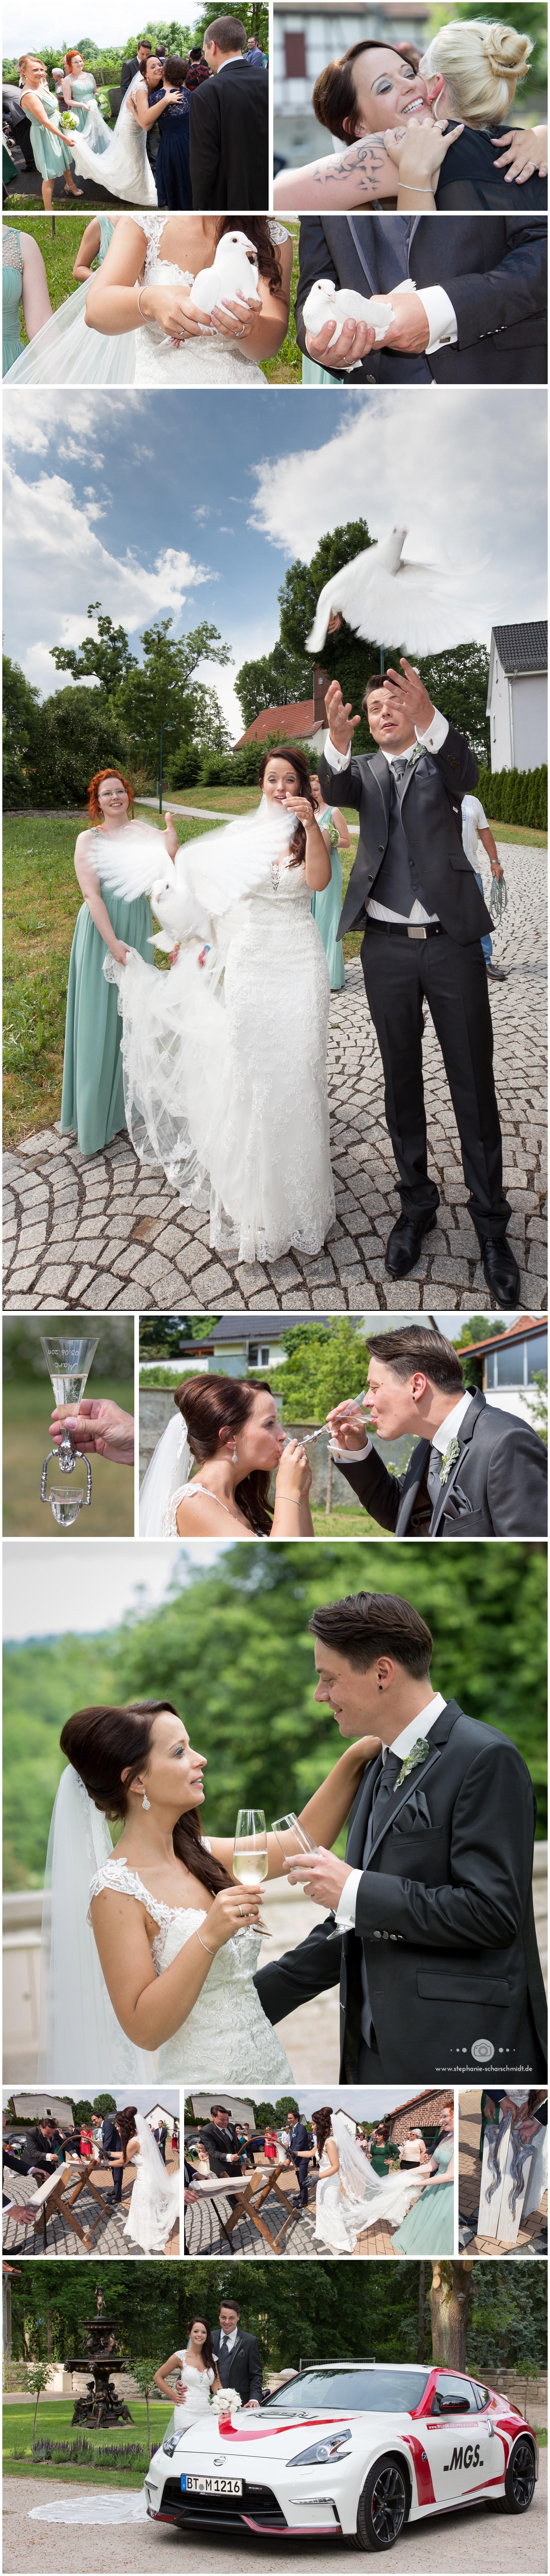 Fotograf Jena - Hochzeitsfotograf Thüringen